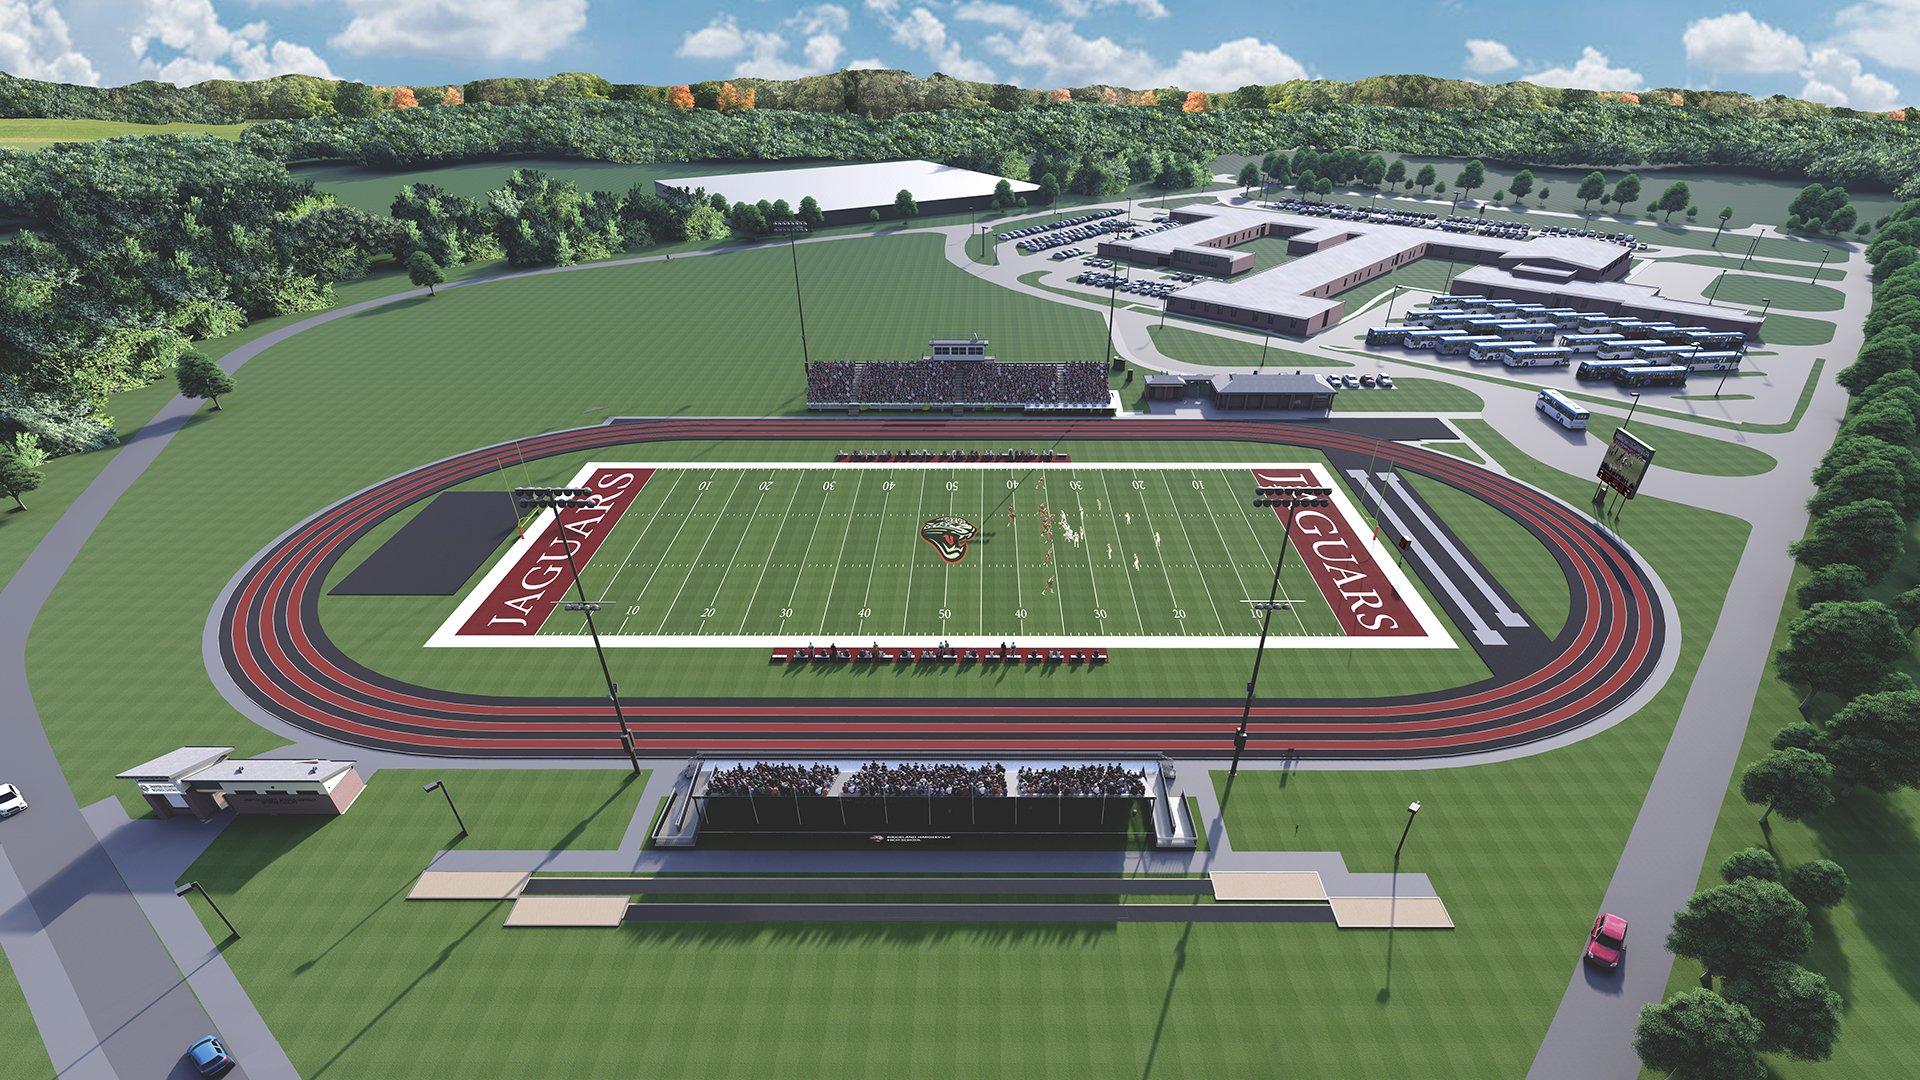 Jasper County Schools Gets New Stadium as Part of Master Plan